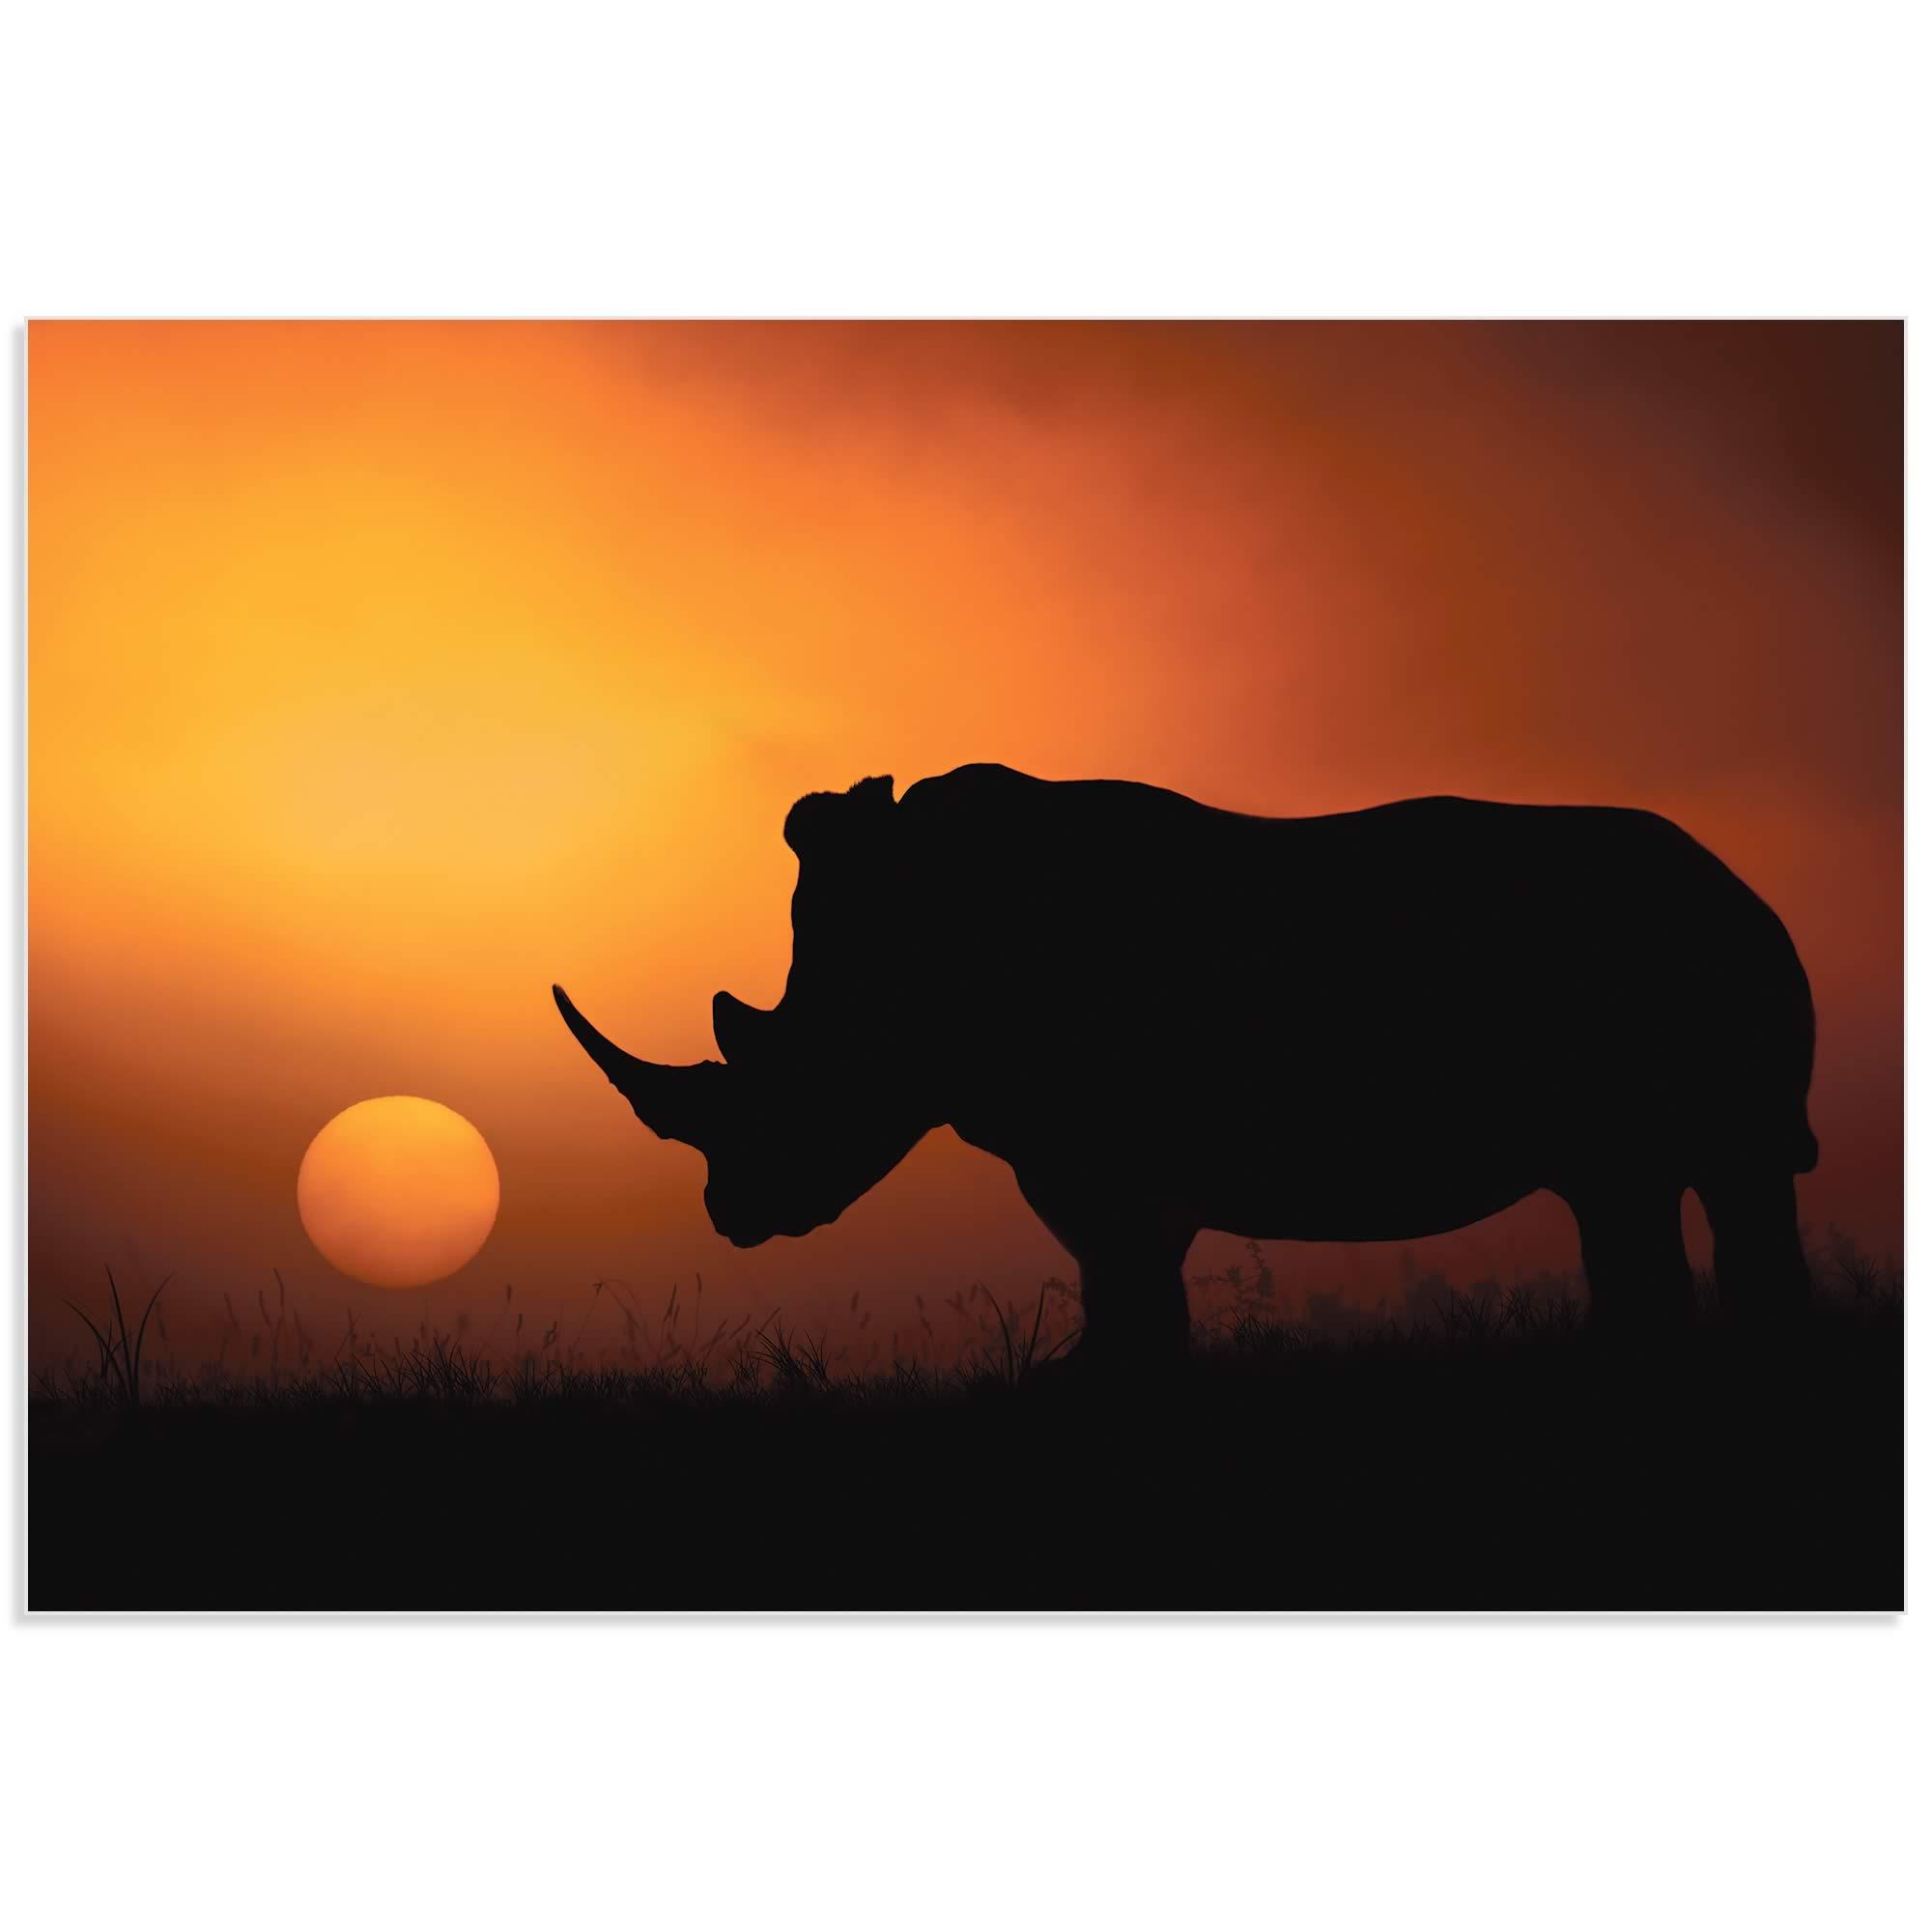 Rhino Sunrise by Mario Moreno - Rhino Silhouette Art on Metal or Acrylic - Alternate View 2